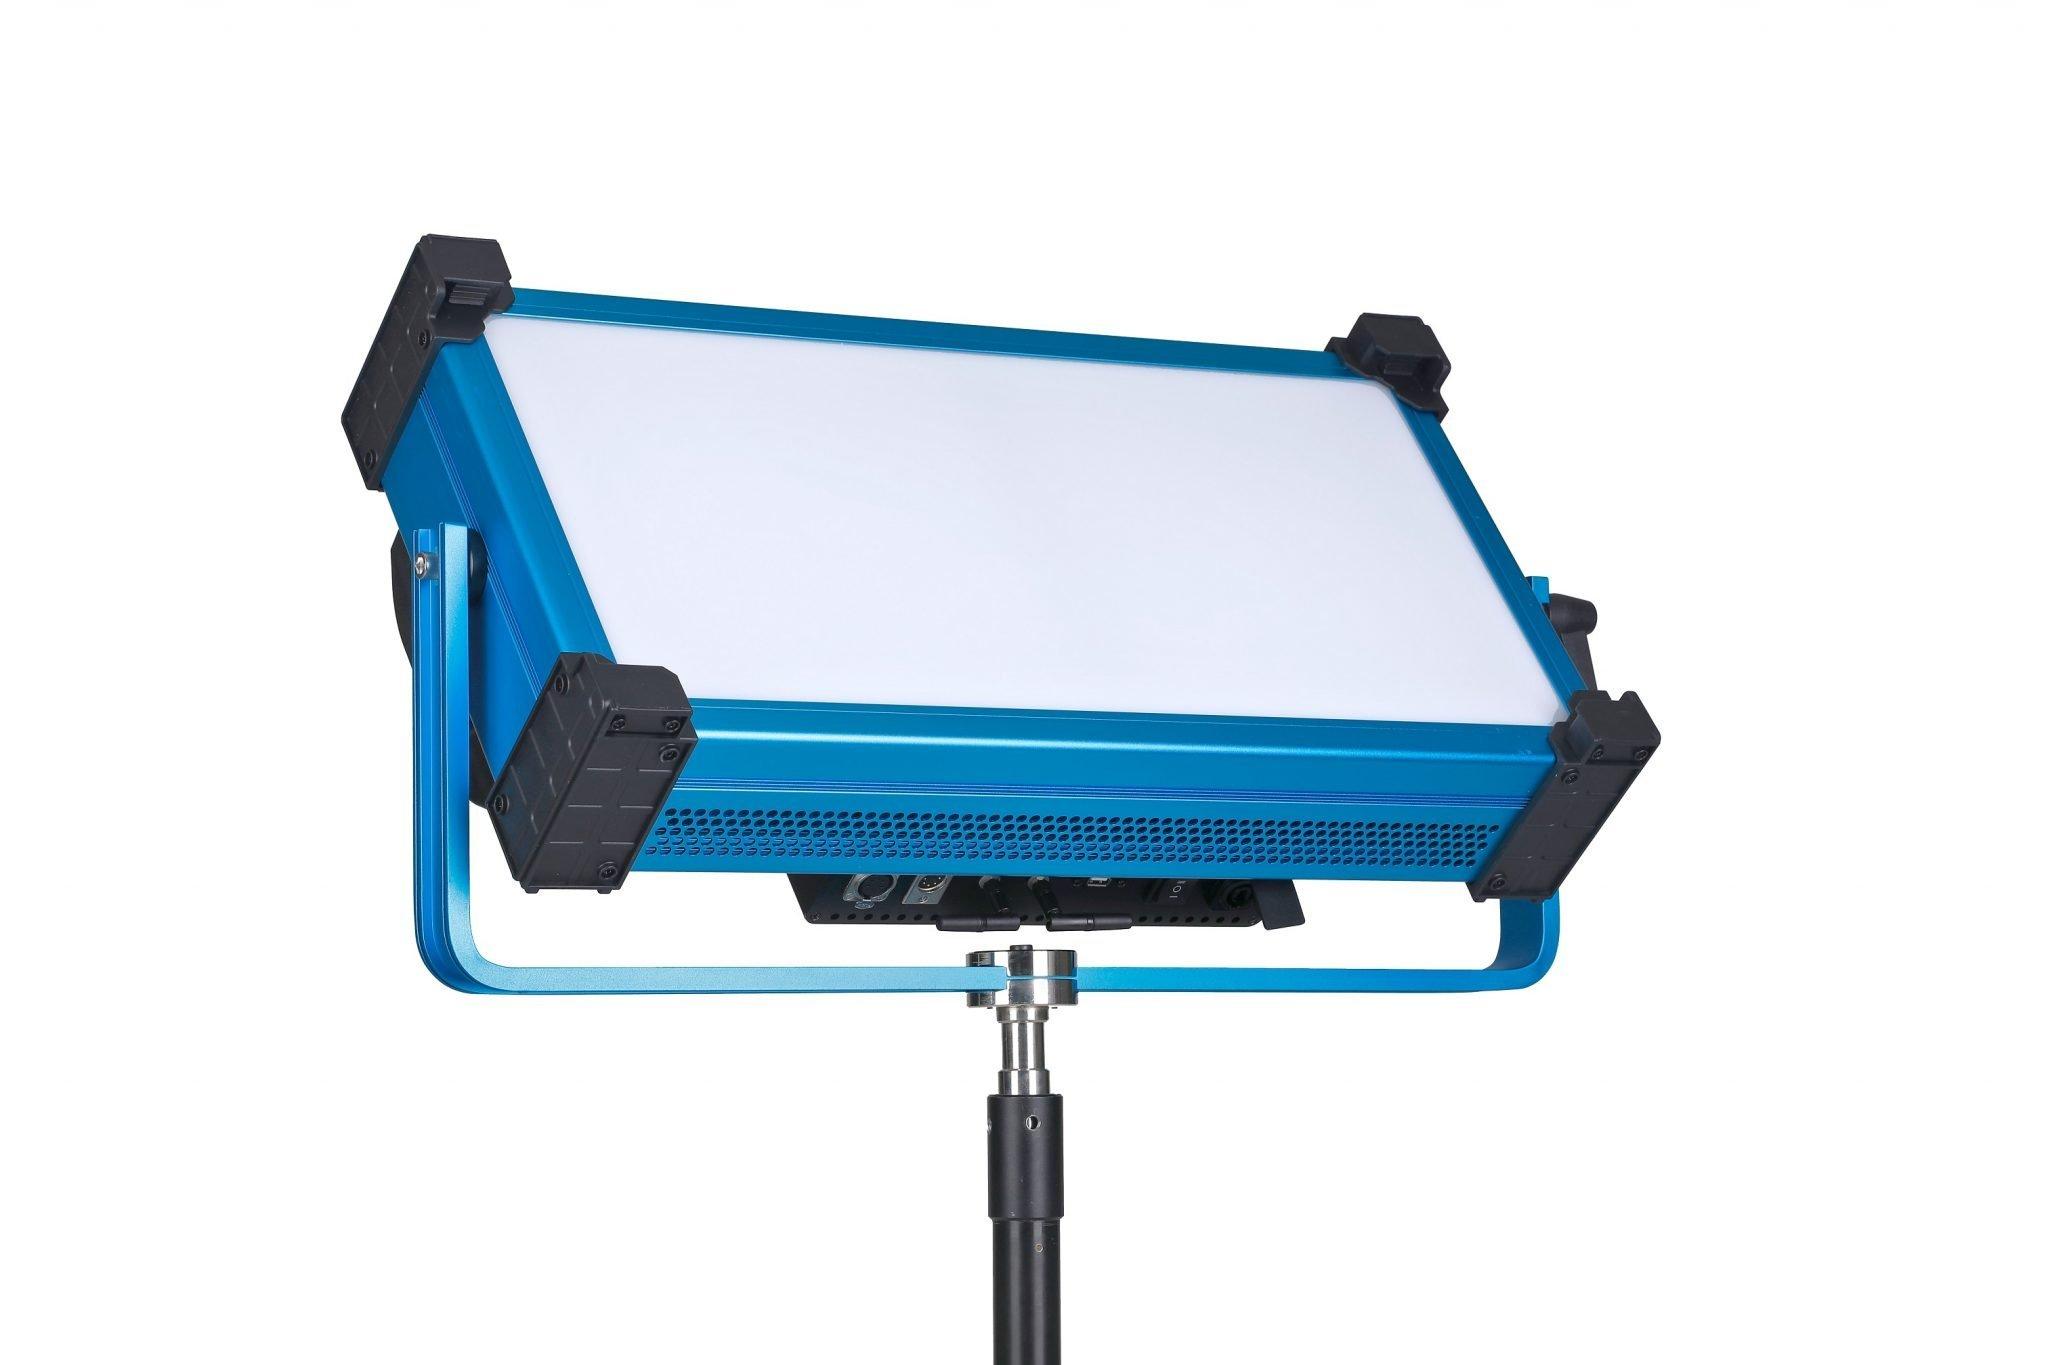 Dracast LED Palette Series Bicolor RGB LED video light